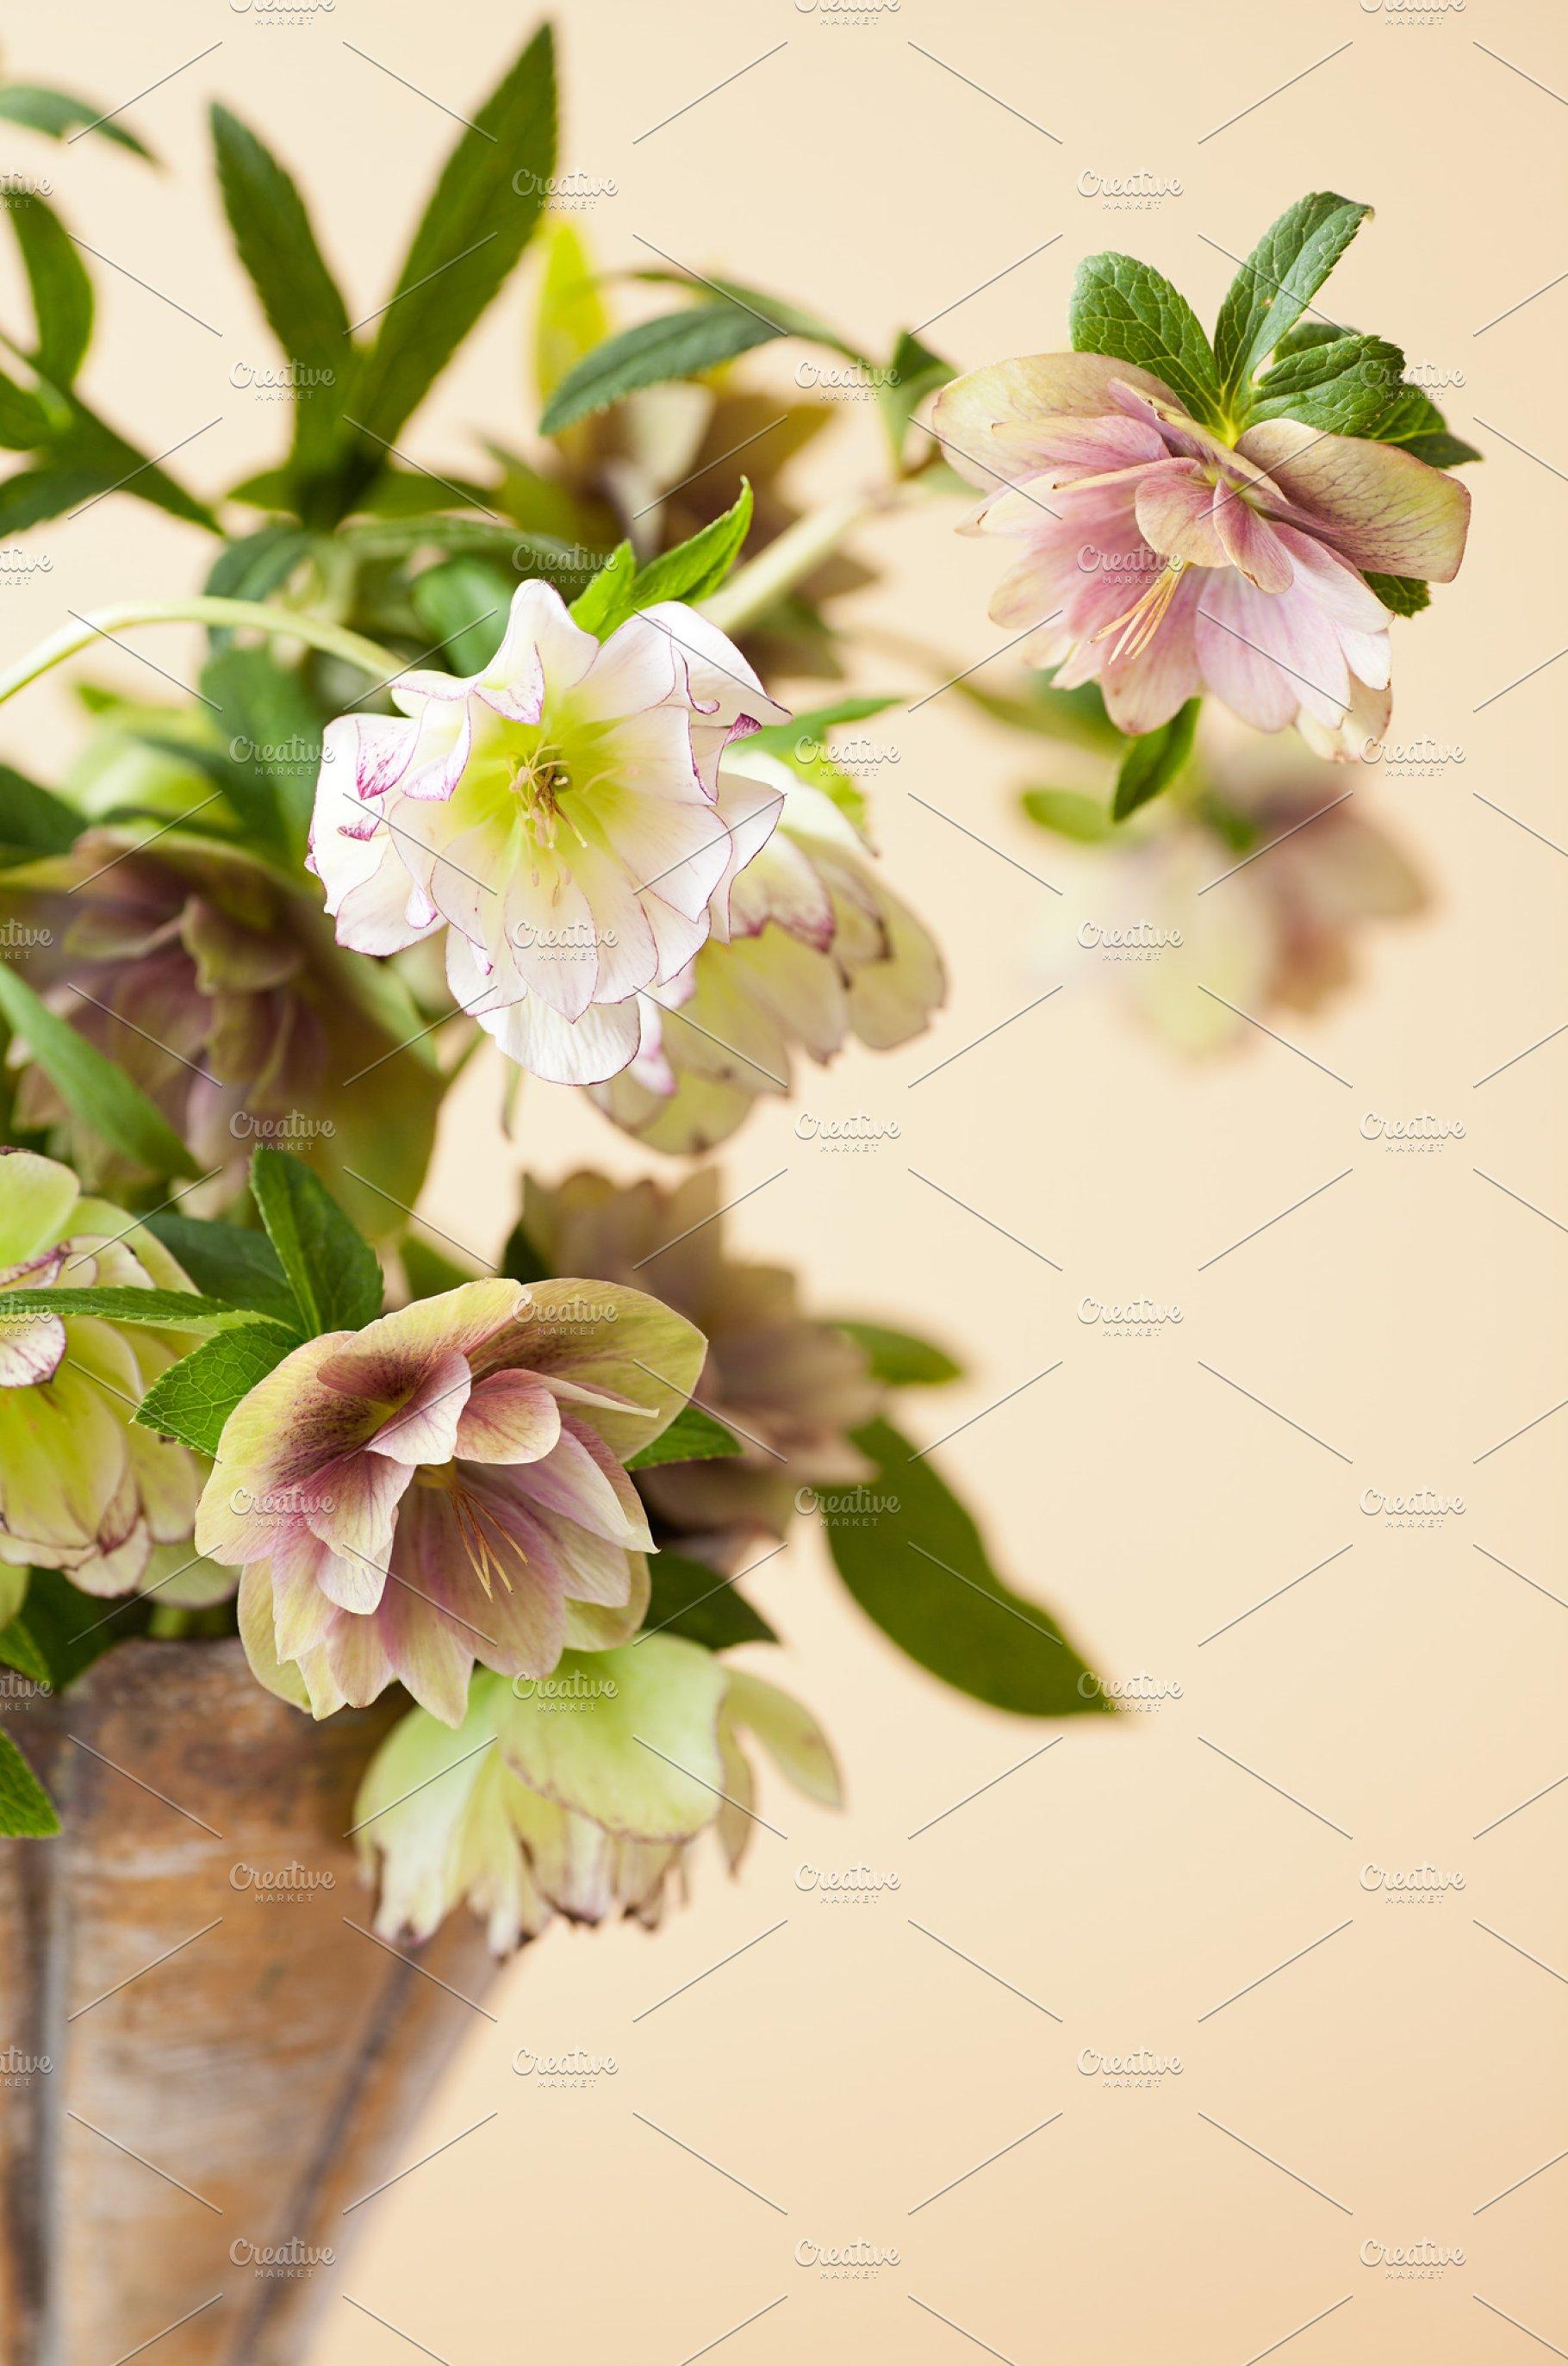 Lenten Roses Aka Hellebore Flowers High Quality Nature Stock